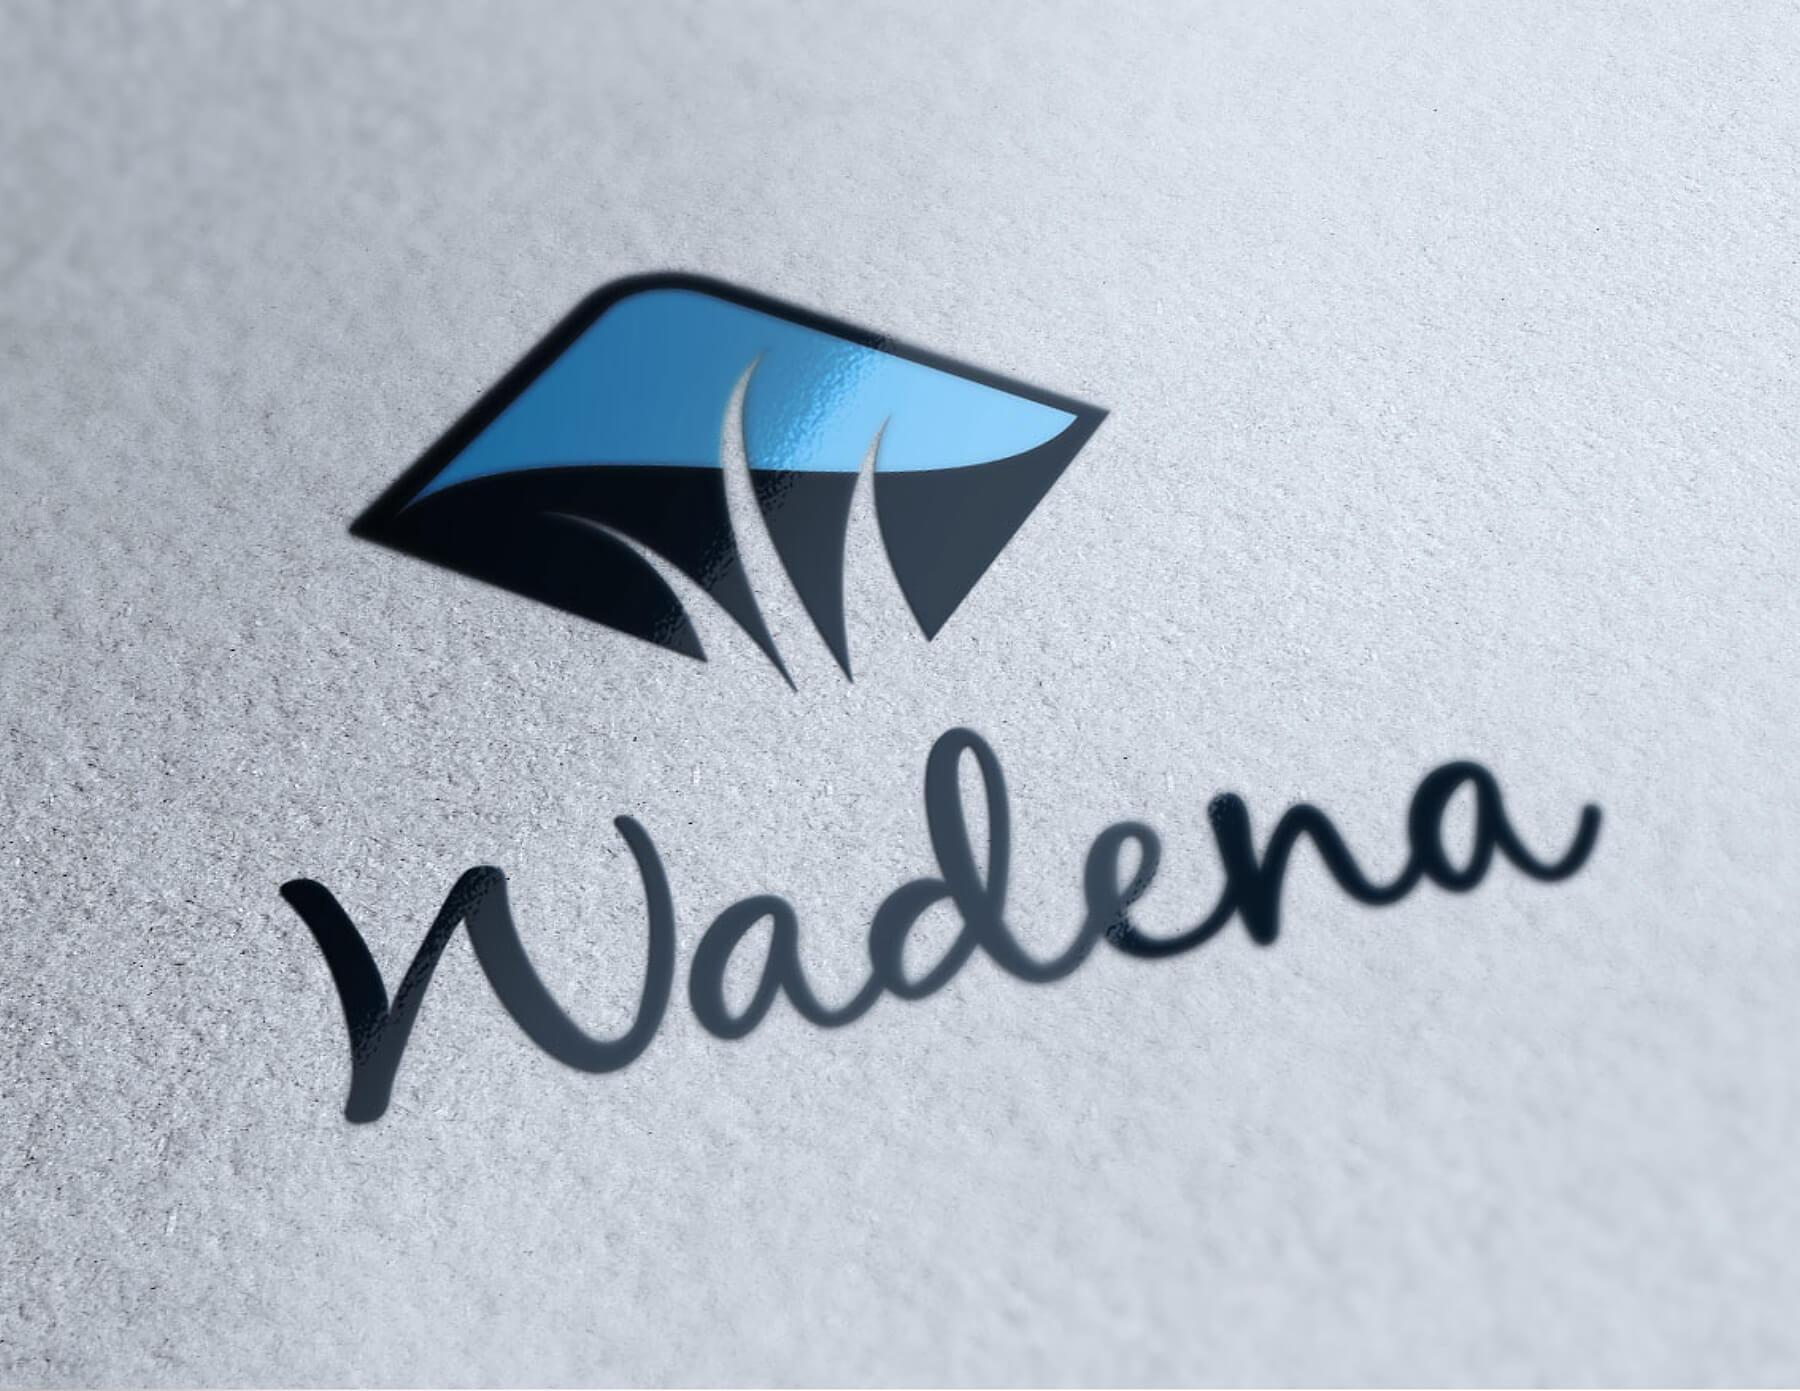 Additional logo design concepts